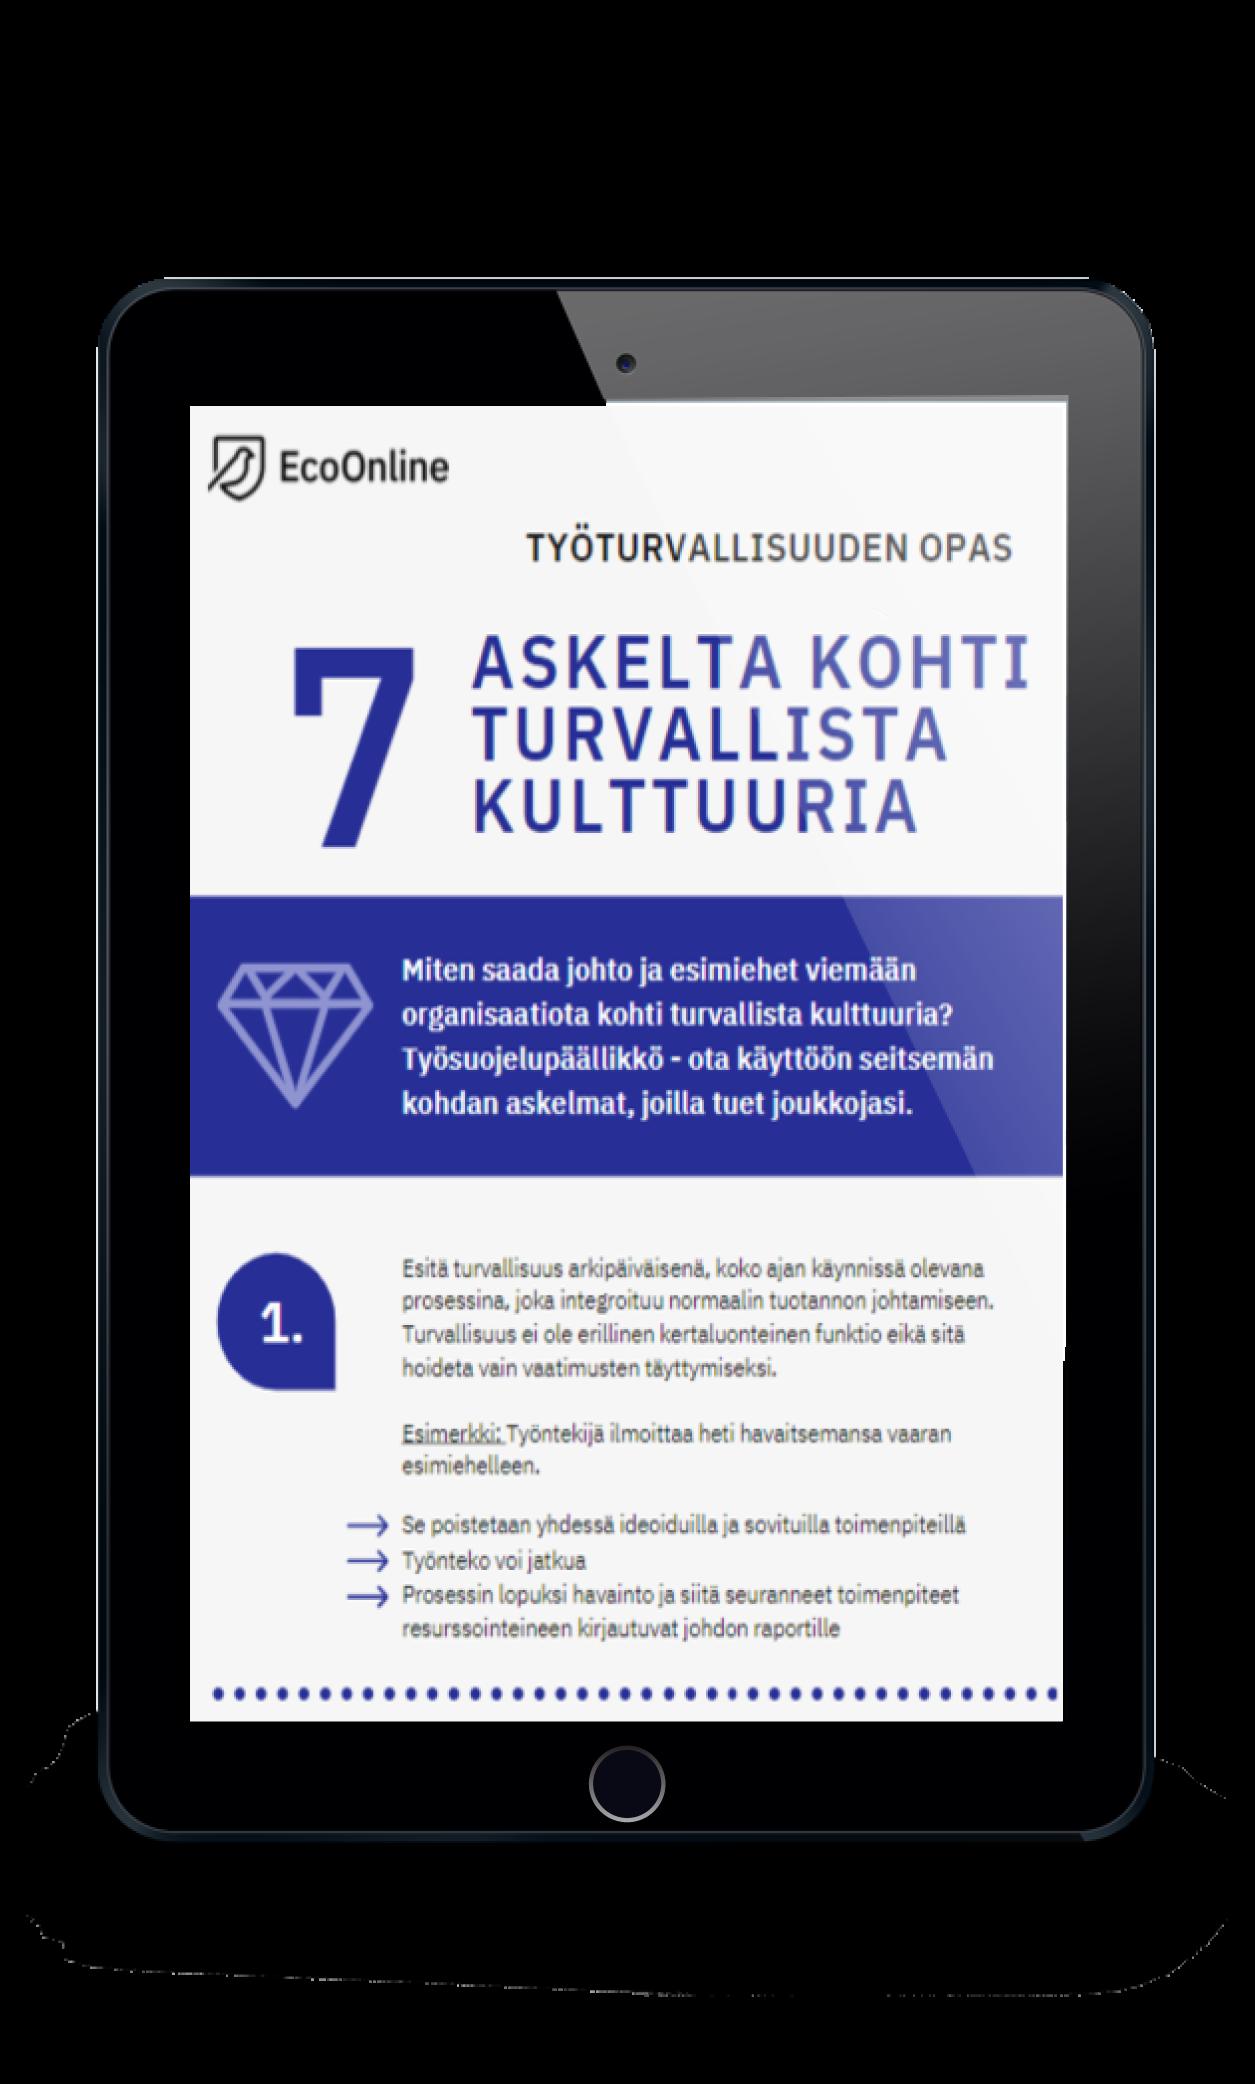 FI_Book Covers_7_askelta_kohti_turvallista_kulttuuria